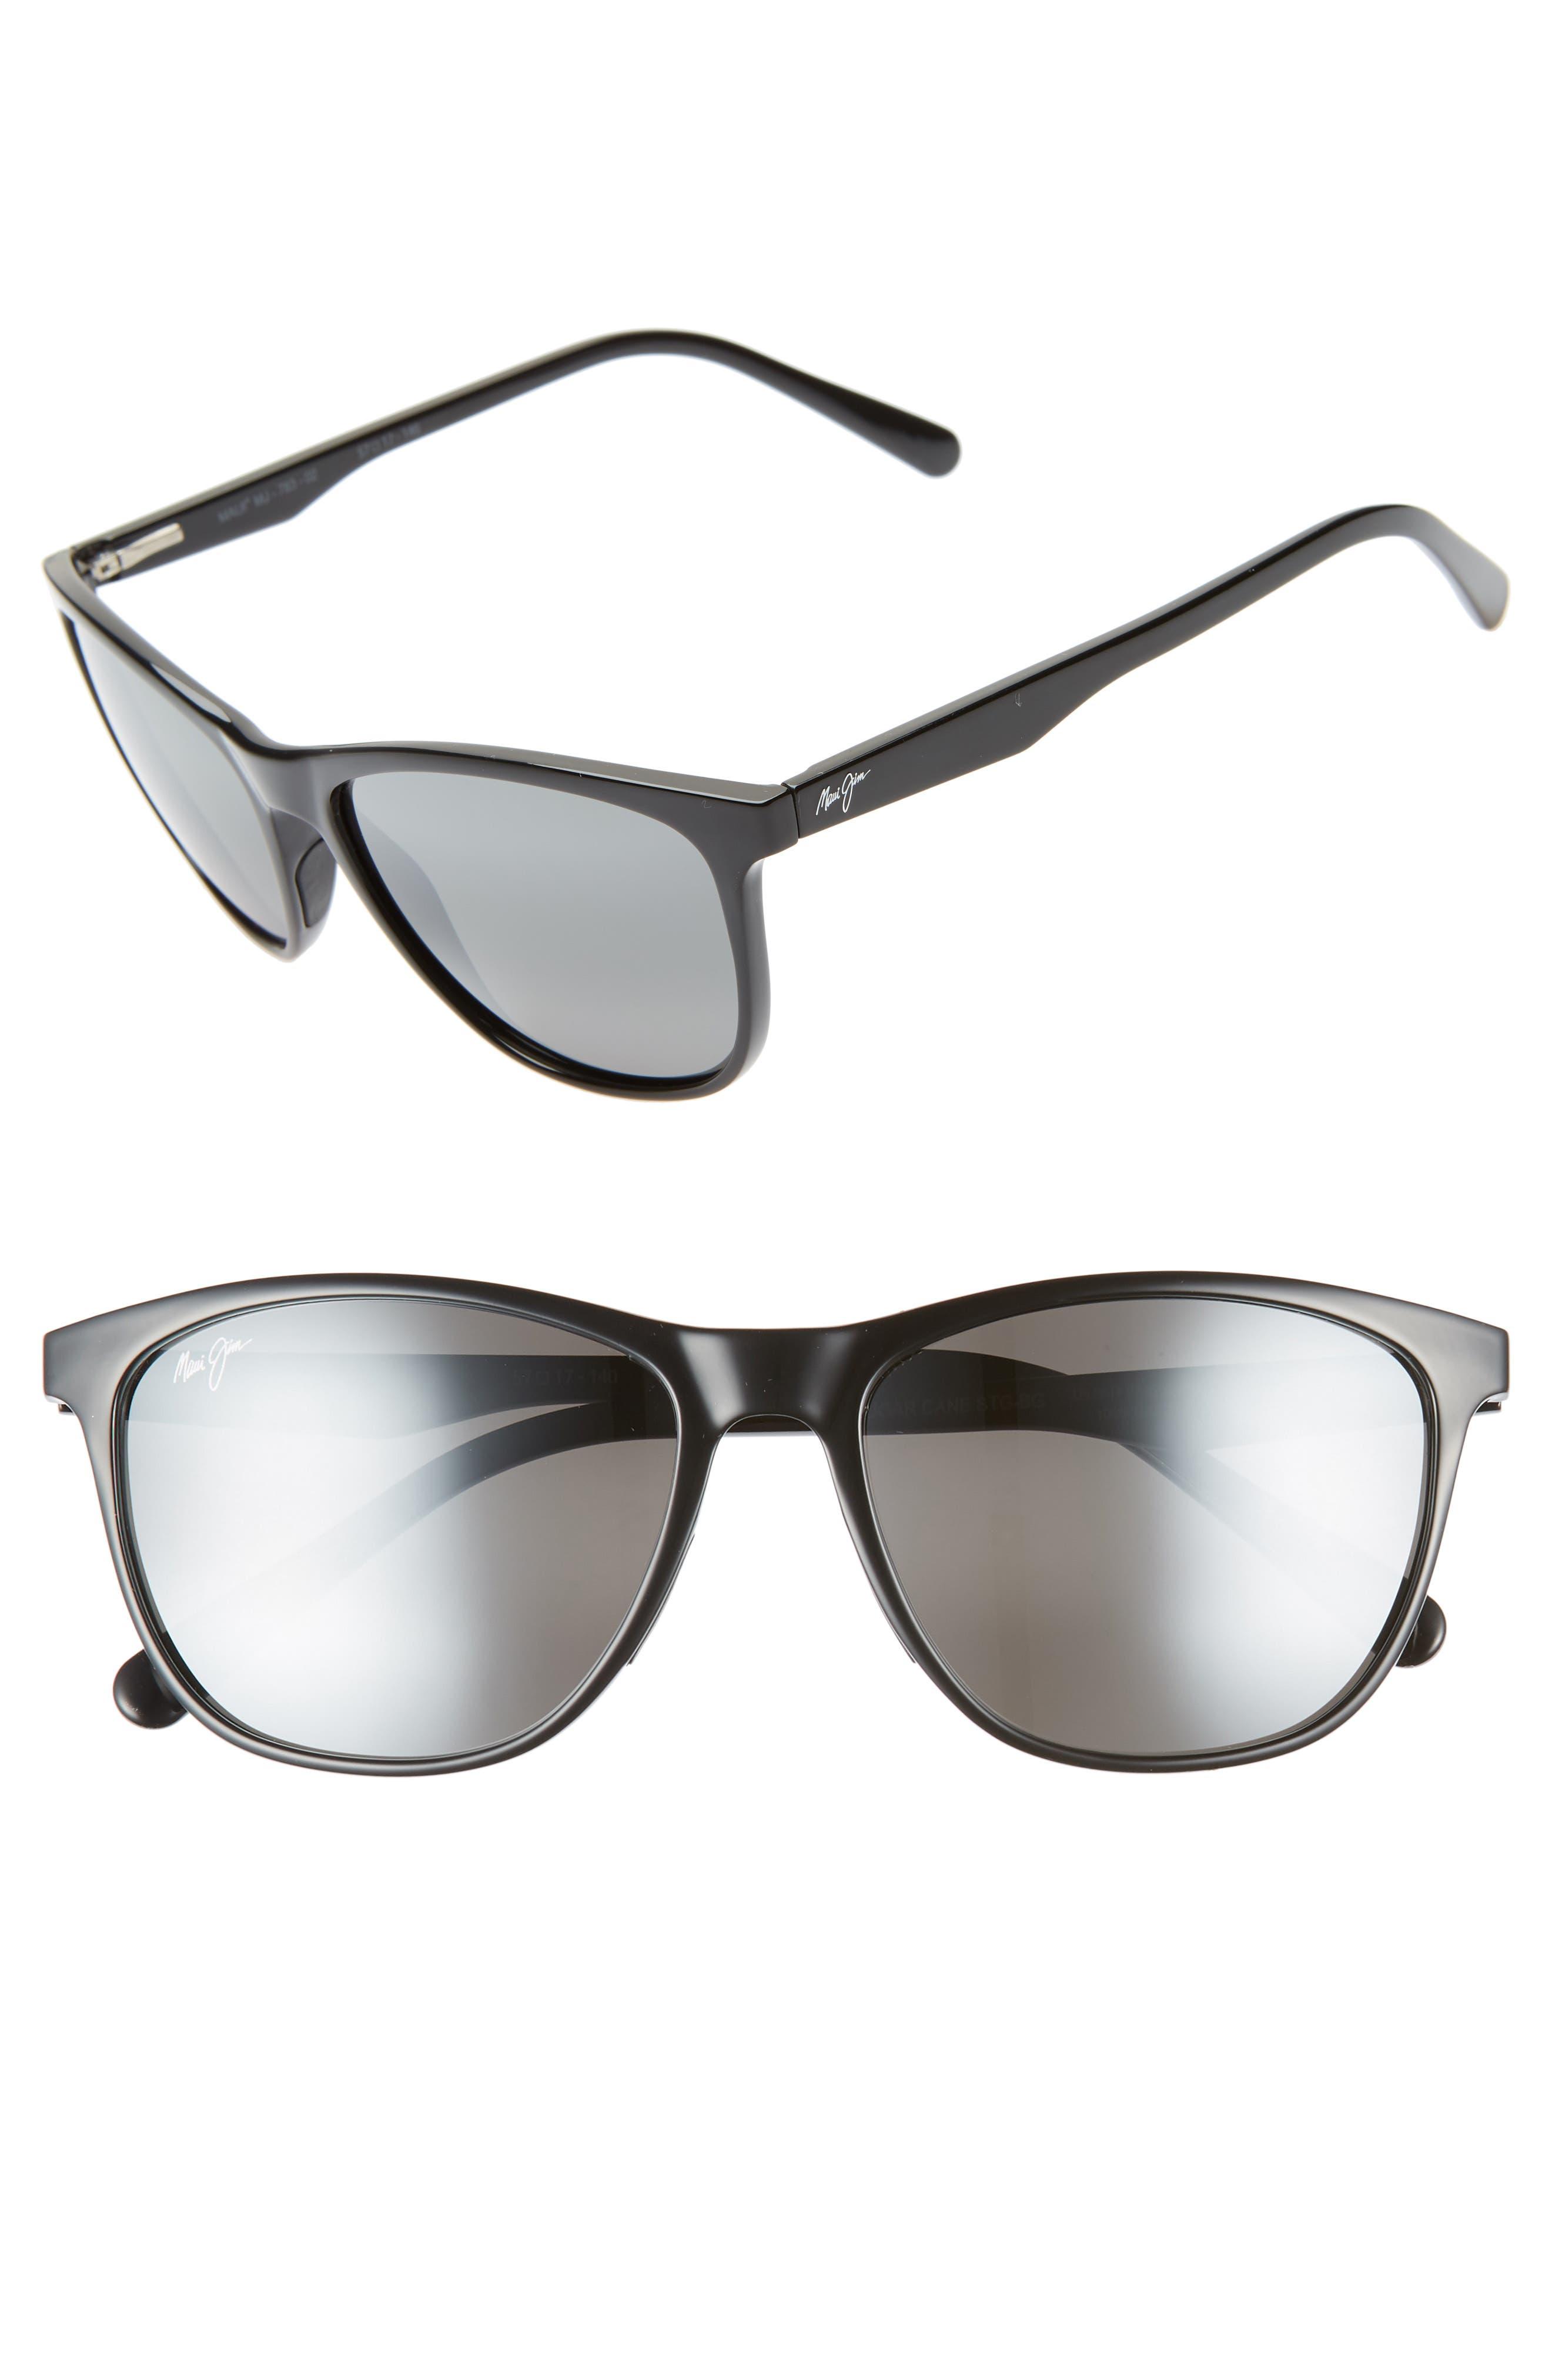 Maui Jim Sugar Cane 57Mm Polarizedplus2 Sunglasses - Gloss Black/ Neutral Grey